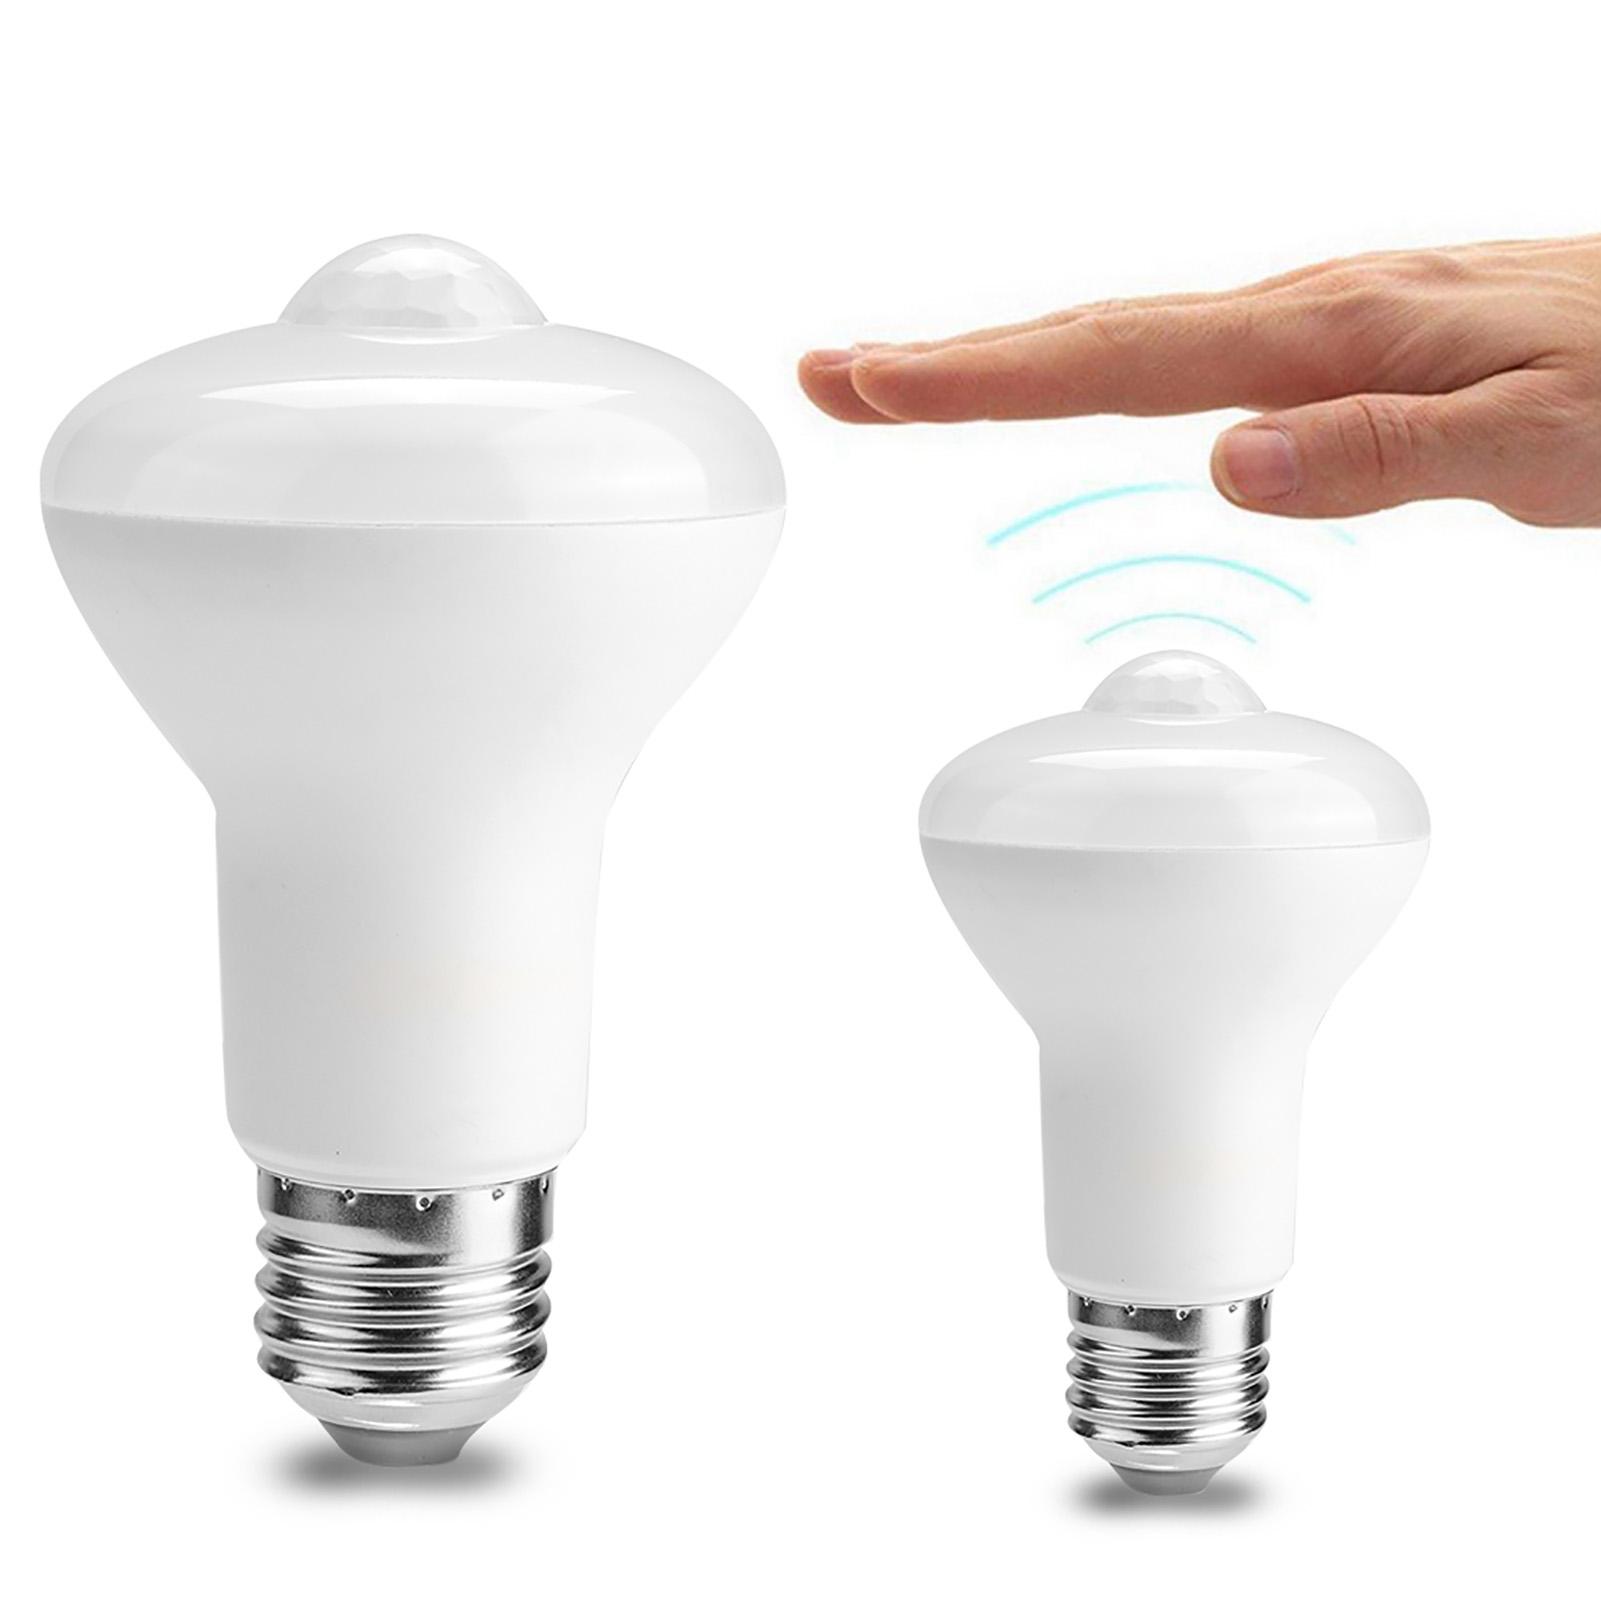 5W-7W-E27-LED-Motion-Sensor-Light-Bulb-Infrared-Human-Induction-Auto-Lamp thumbnail 14